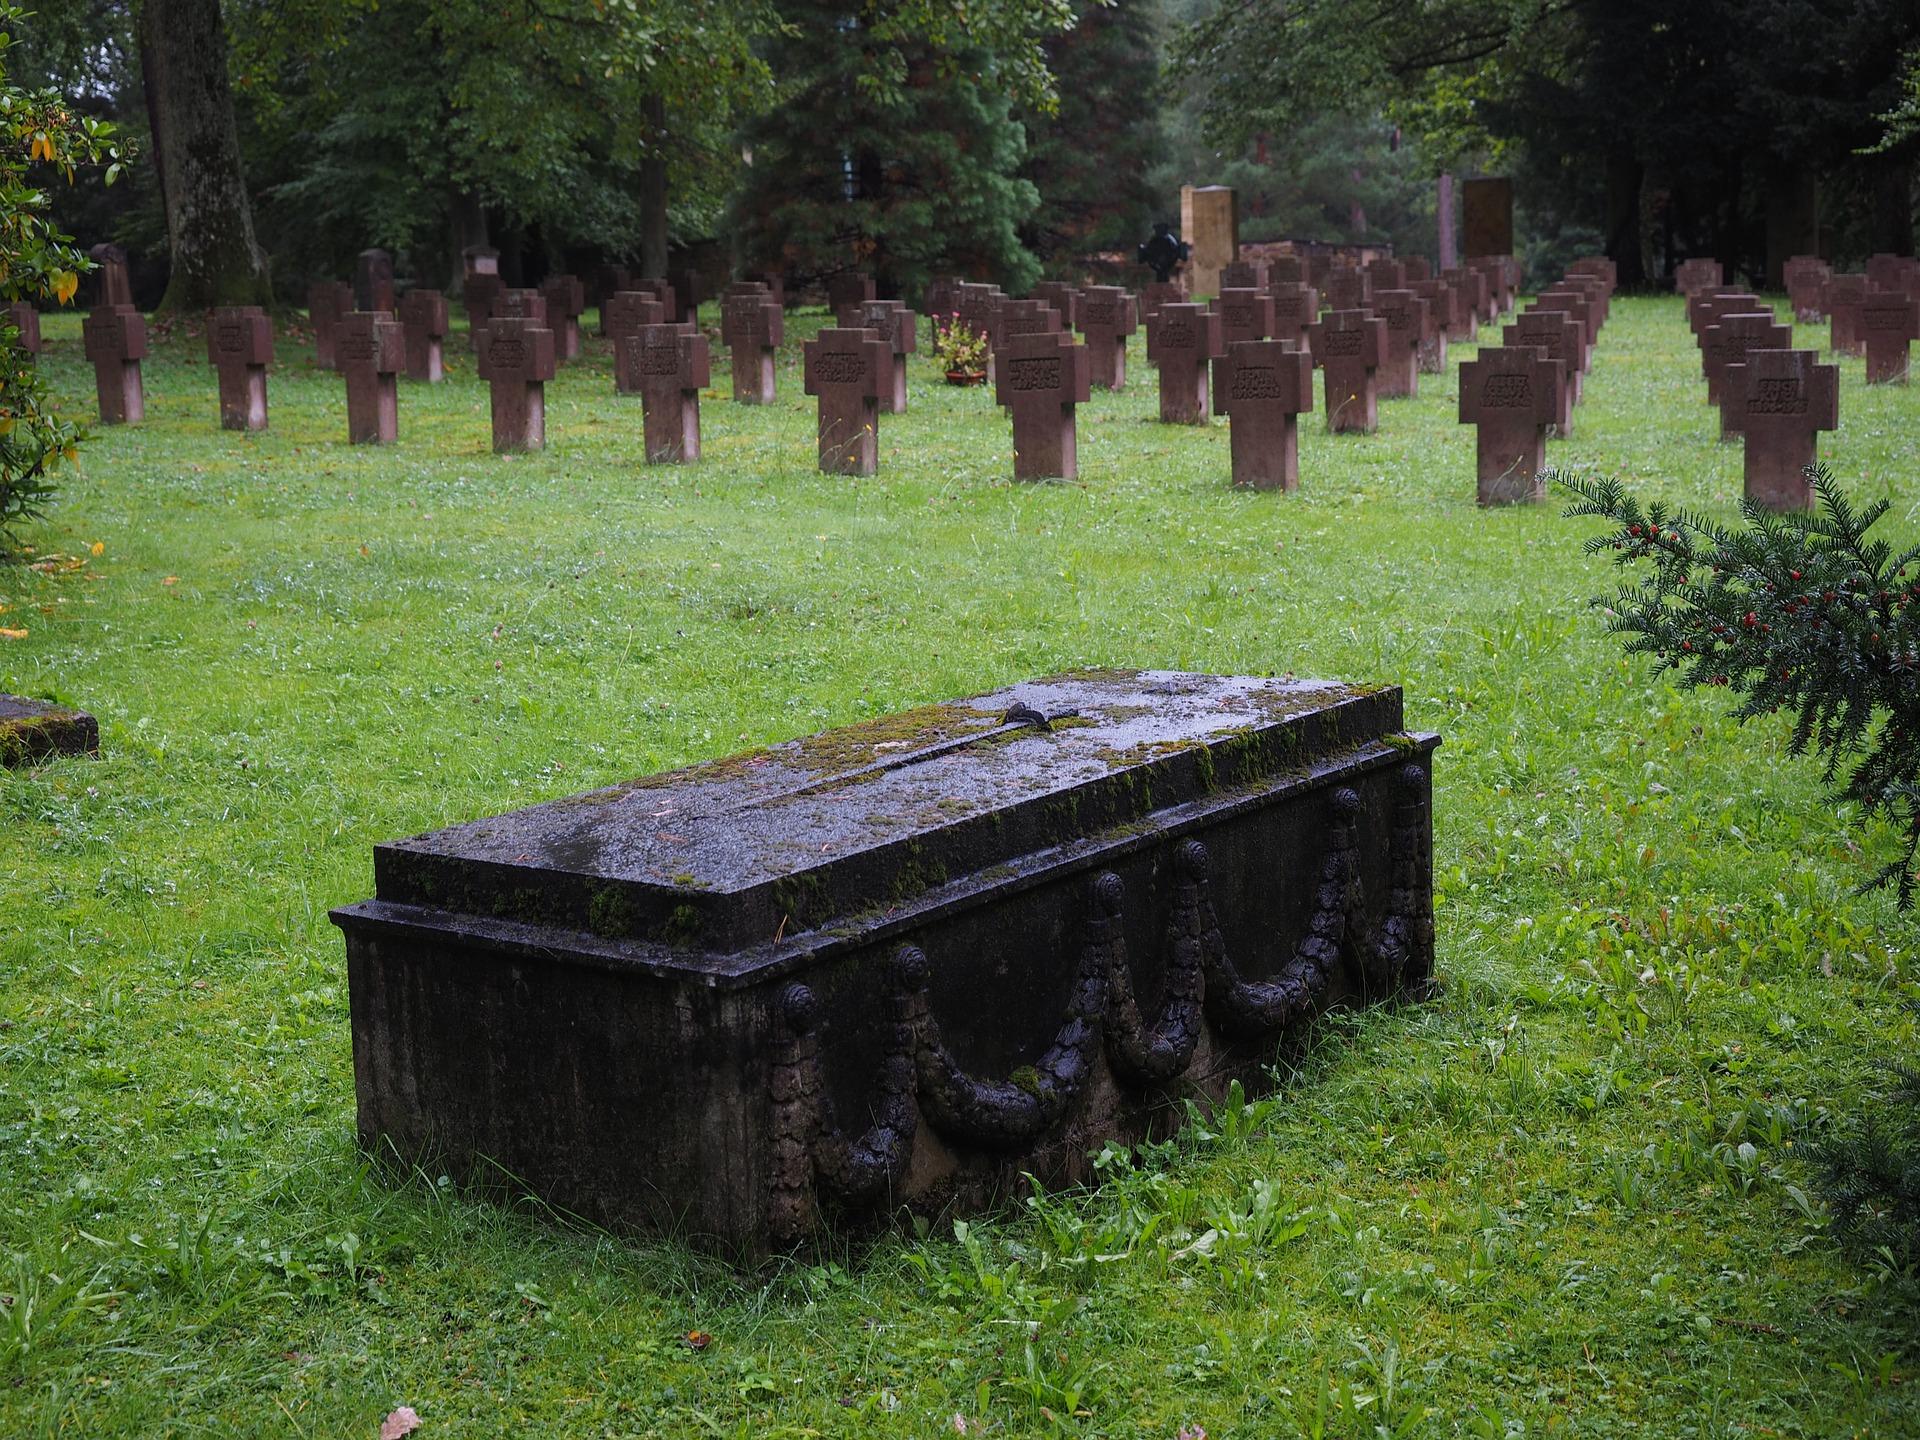 genghis khan grave-stones-694096_1920